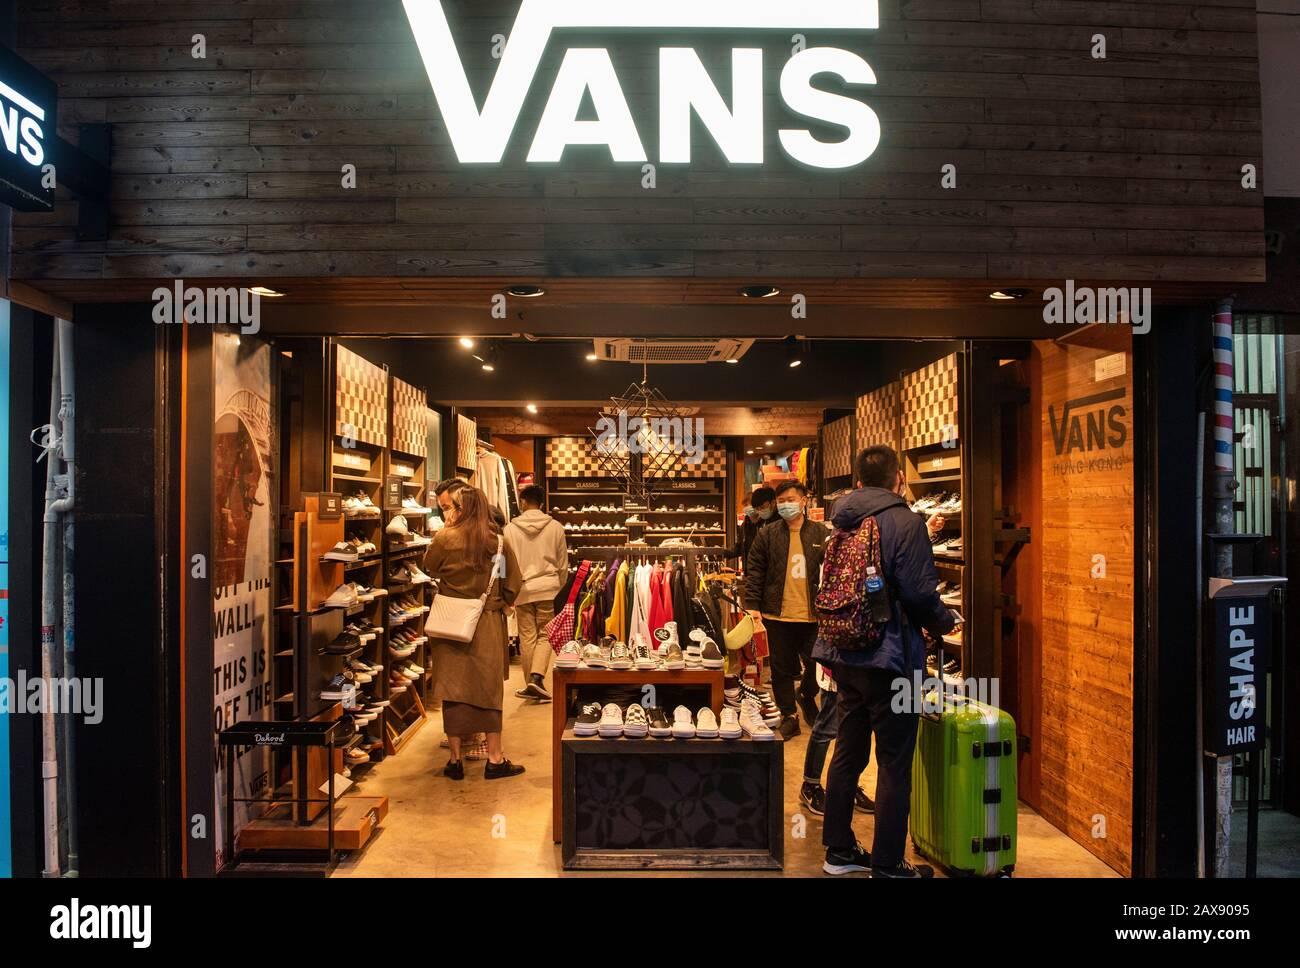 skateboarding shoes Vans store seen